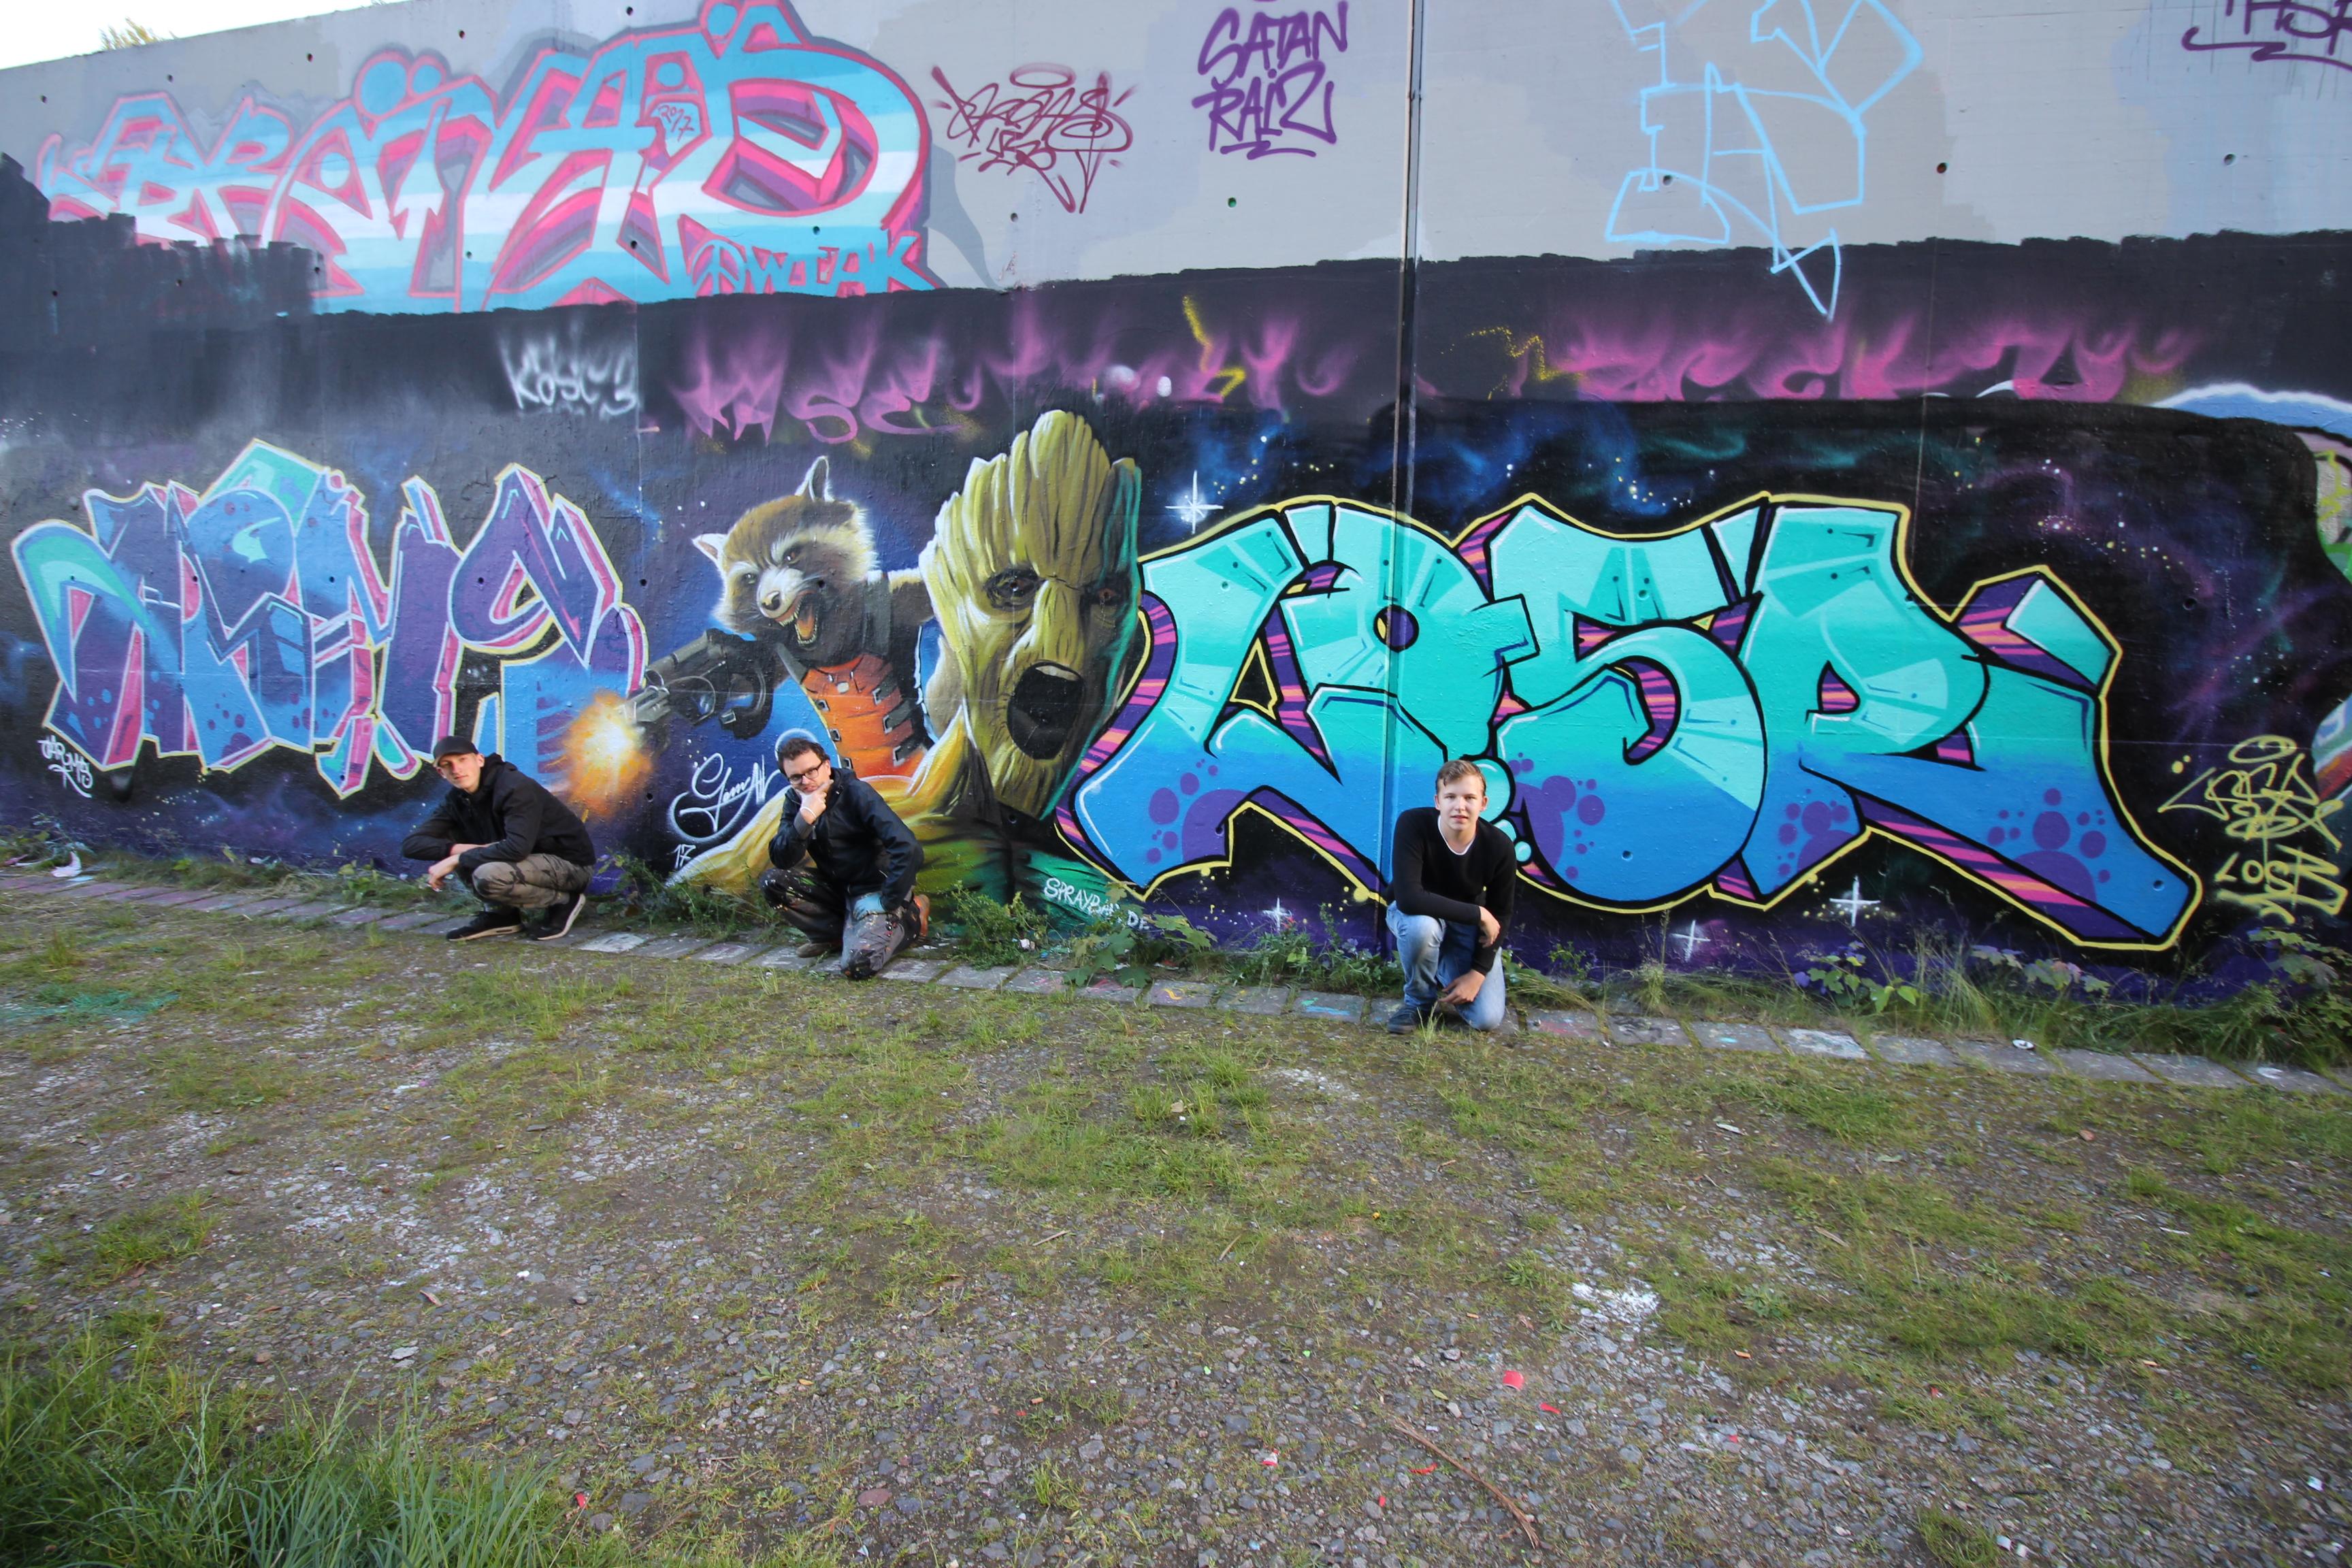 Graffitiworkshop Fortgeschrittene Hall Gruppenfoto